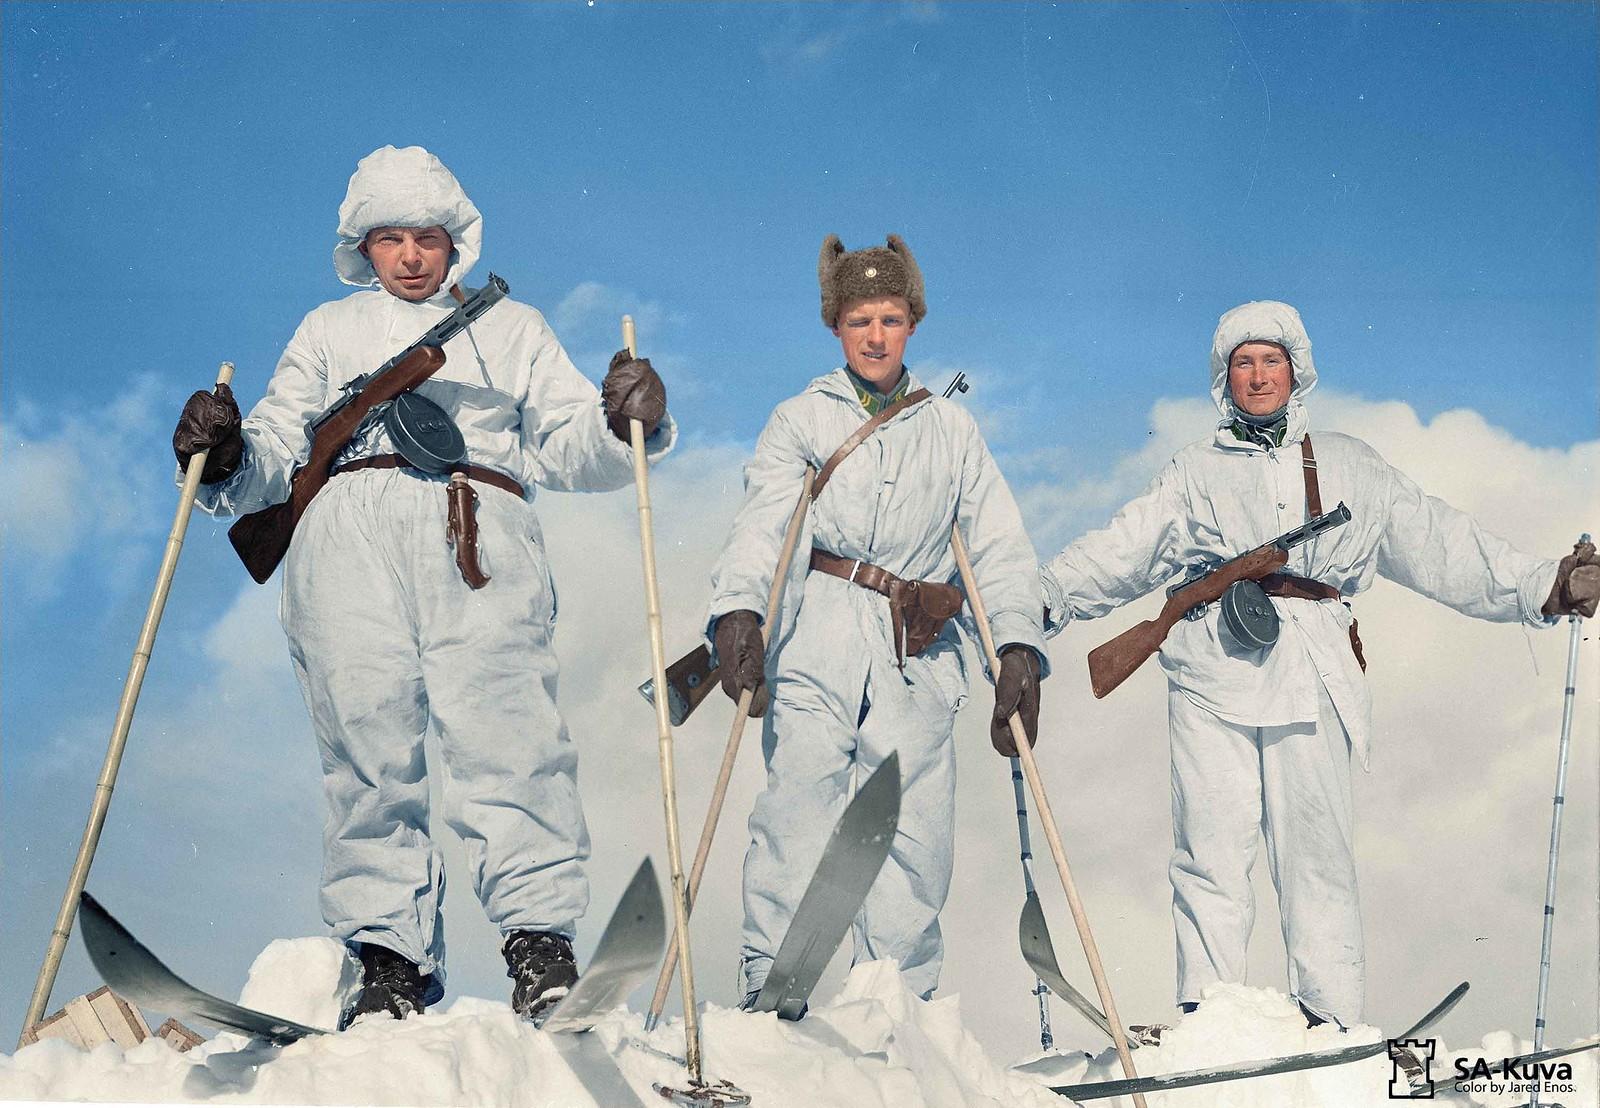 Finnish Ski Troops Crest A Hazardous Nordic Mountain